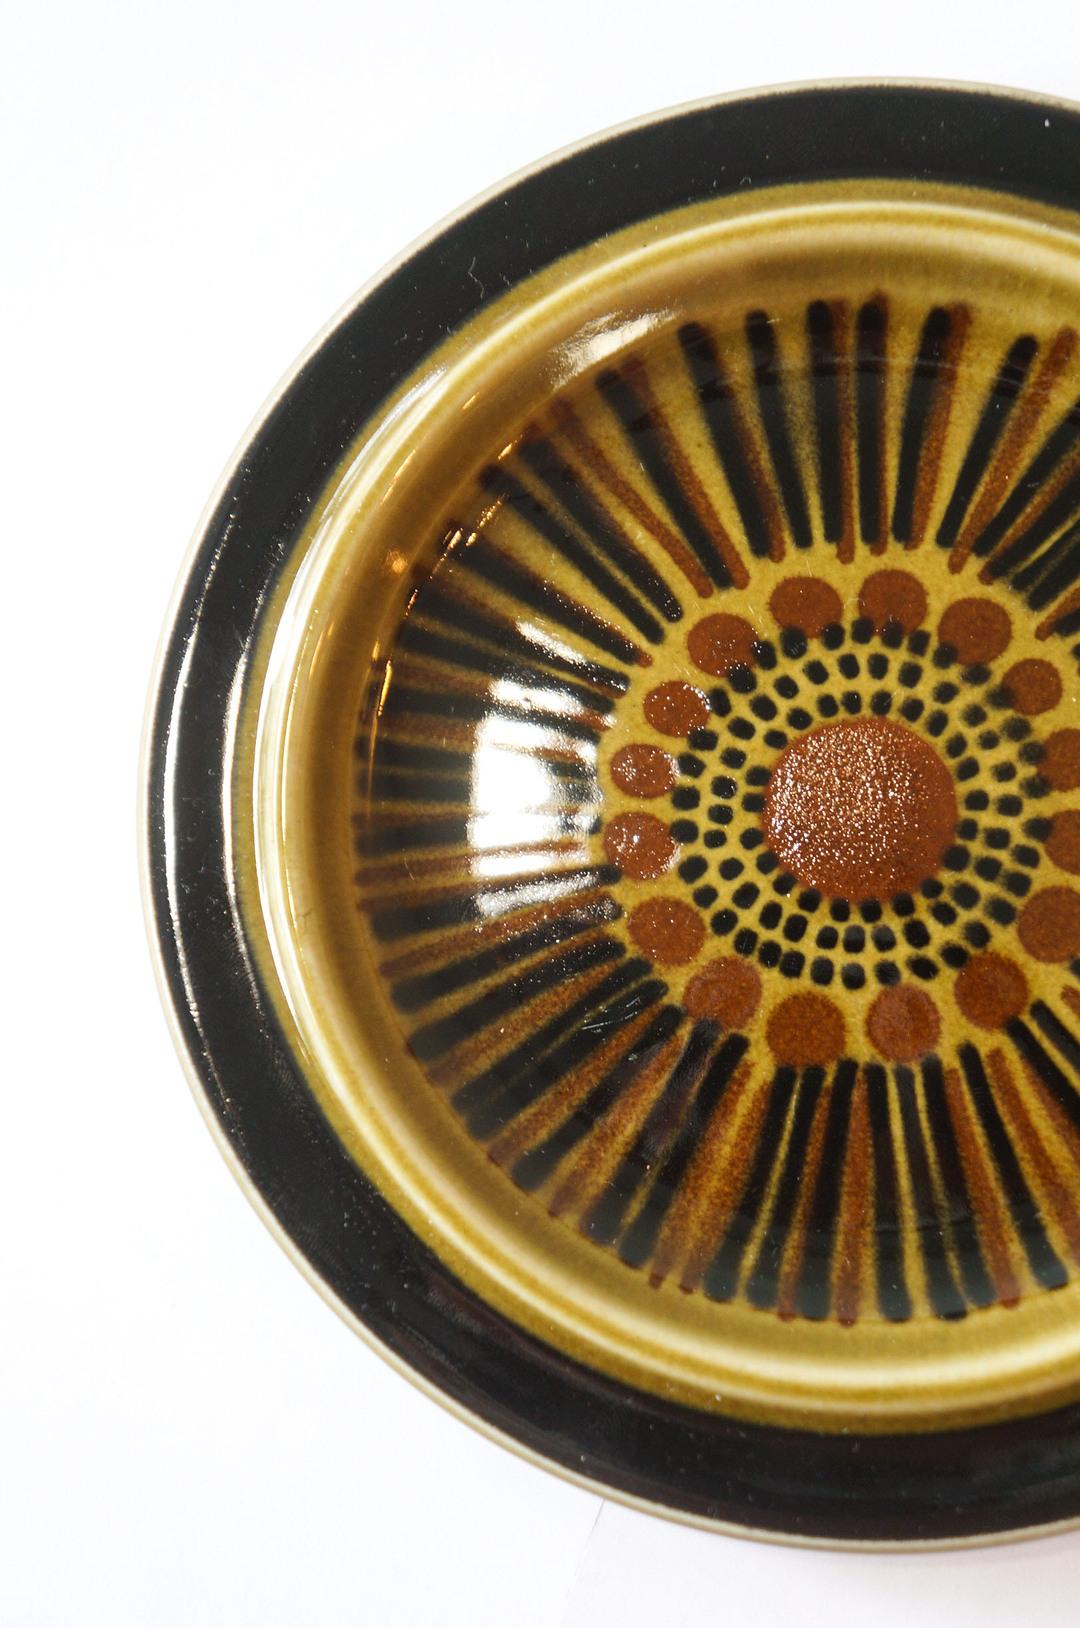 ARABIA Kosmos Plate 16cm/アラビア コスモス プレート 16cm ケーキ皿 北欧食器 フィンランドヴィンテージ 1